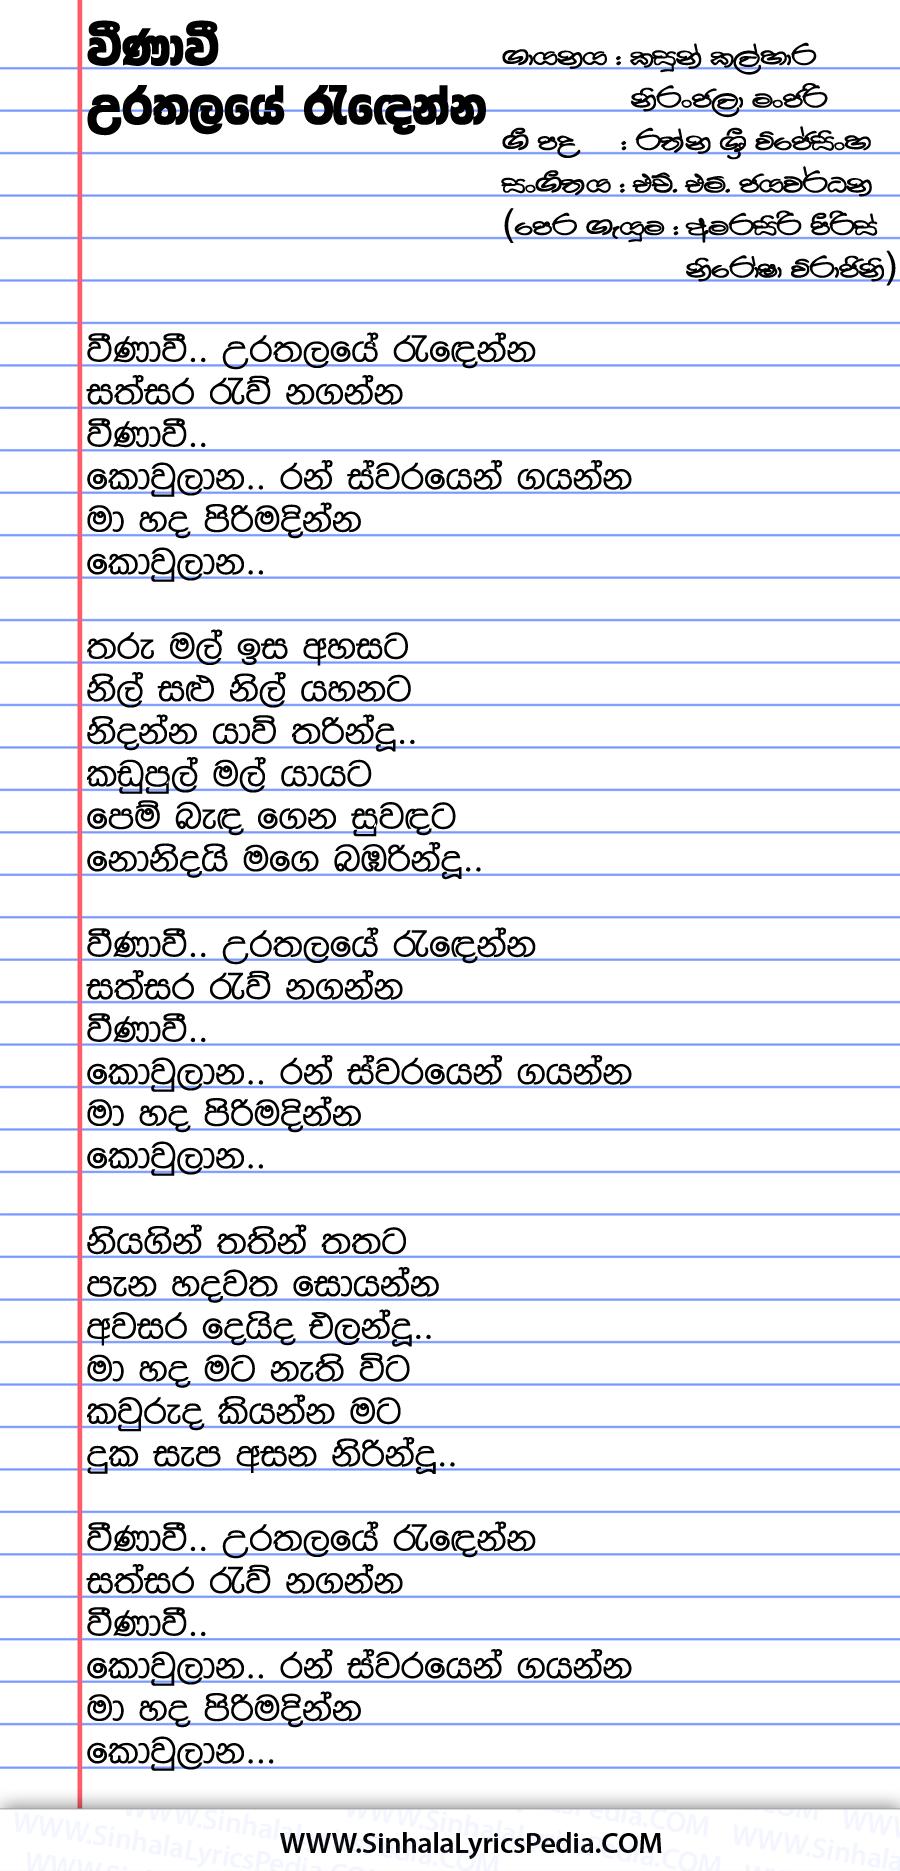 Veenavi Urathalaye Randenna Song Lyrics